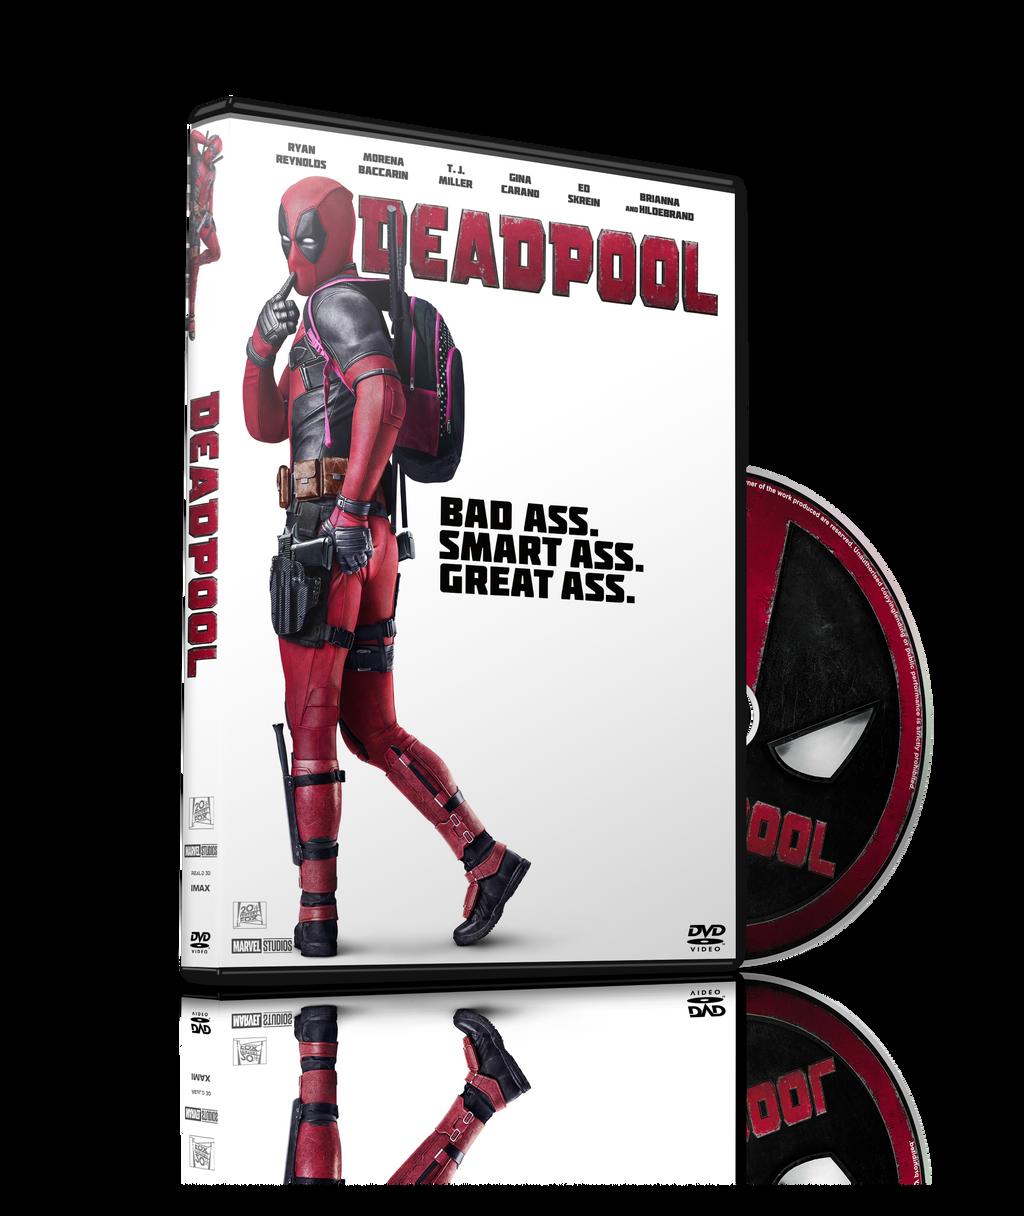 Deadpool 2016 Dvd Cover By Szwejzi On Deviantart